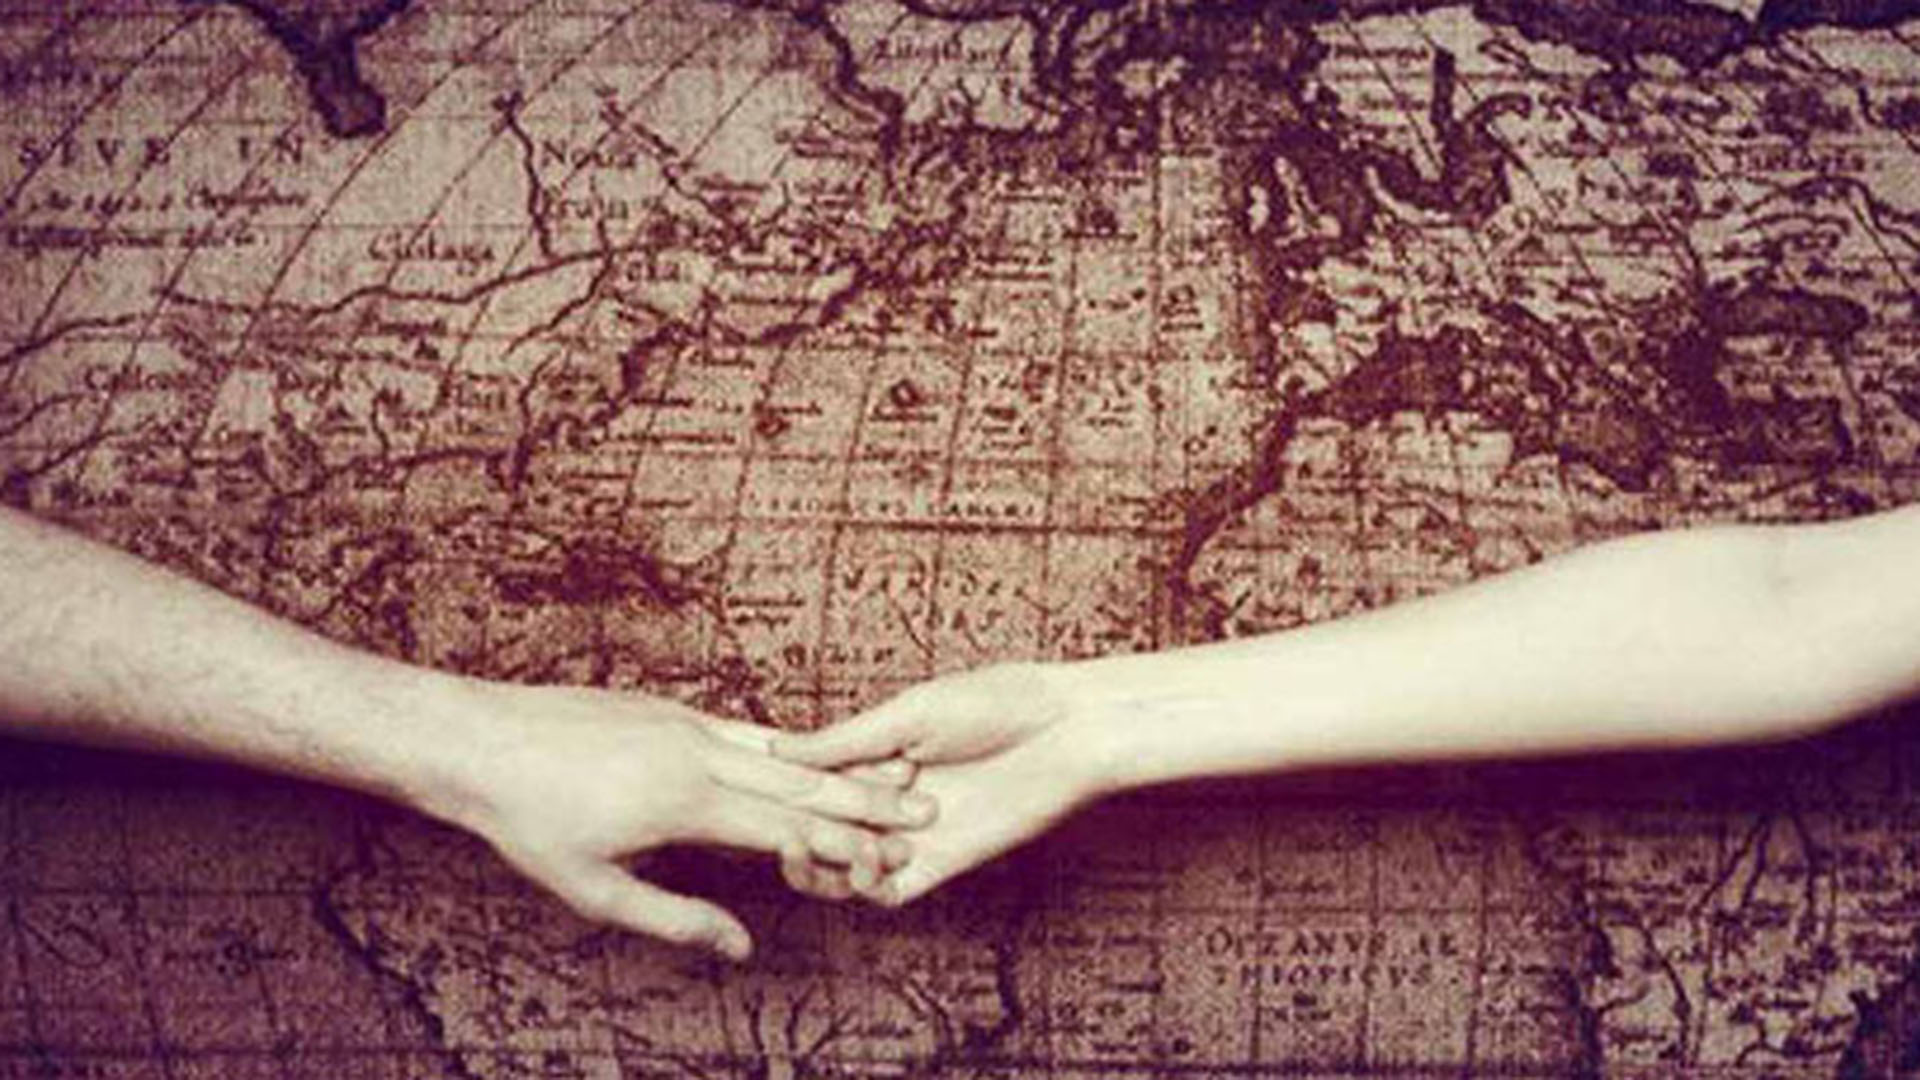 Long Distance Relationship Wallpapers Hd 1920x1080 Wallpaper Teahub Io